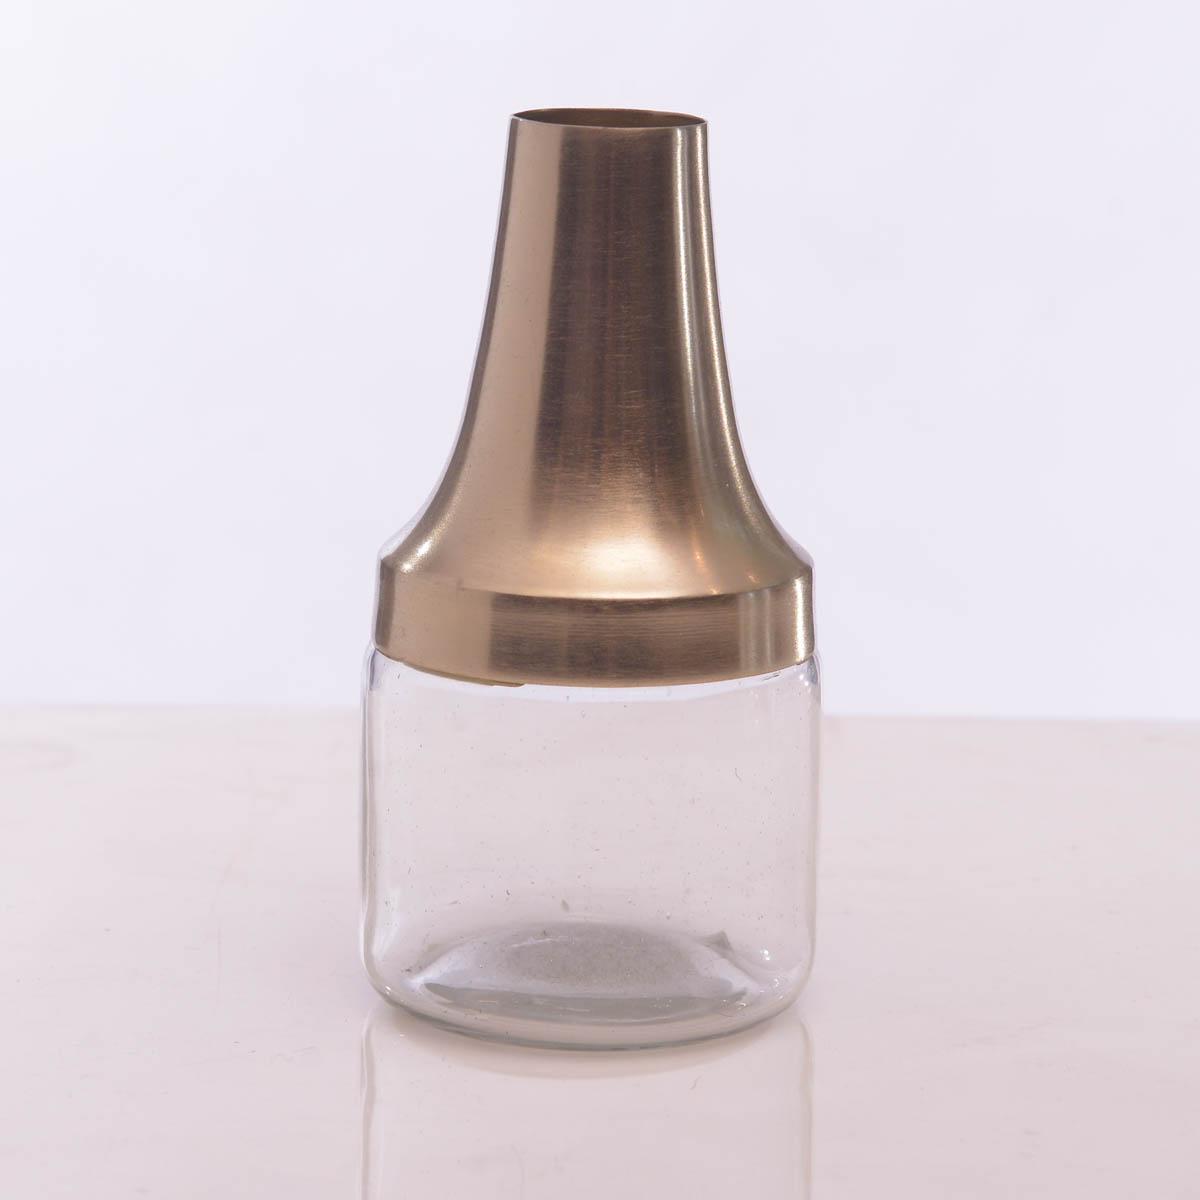 Florero metal y vidrio